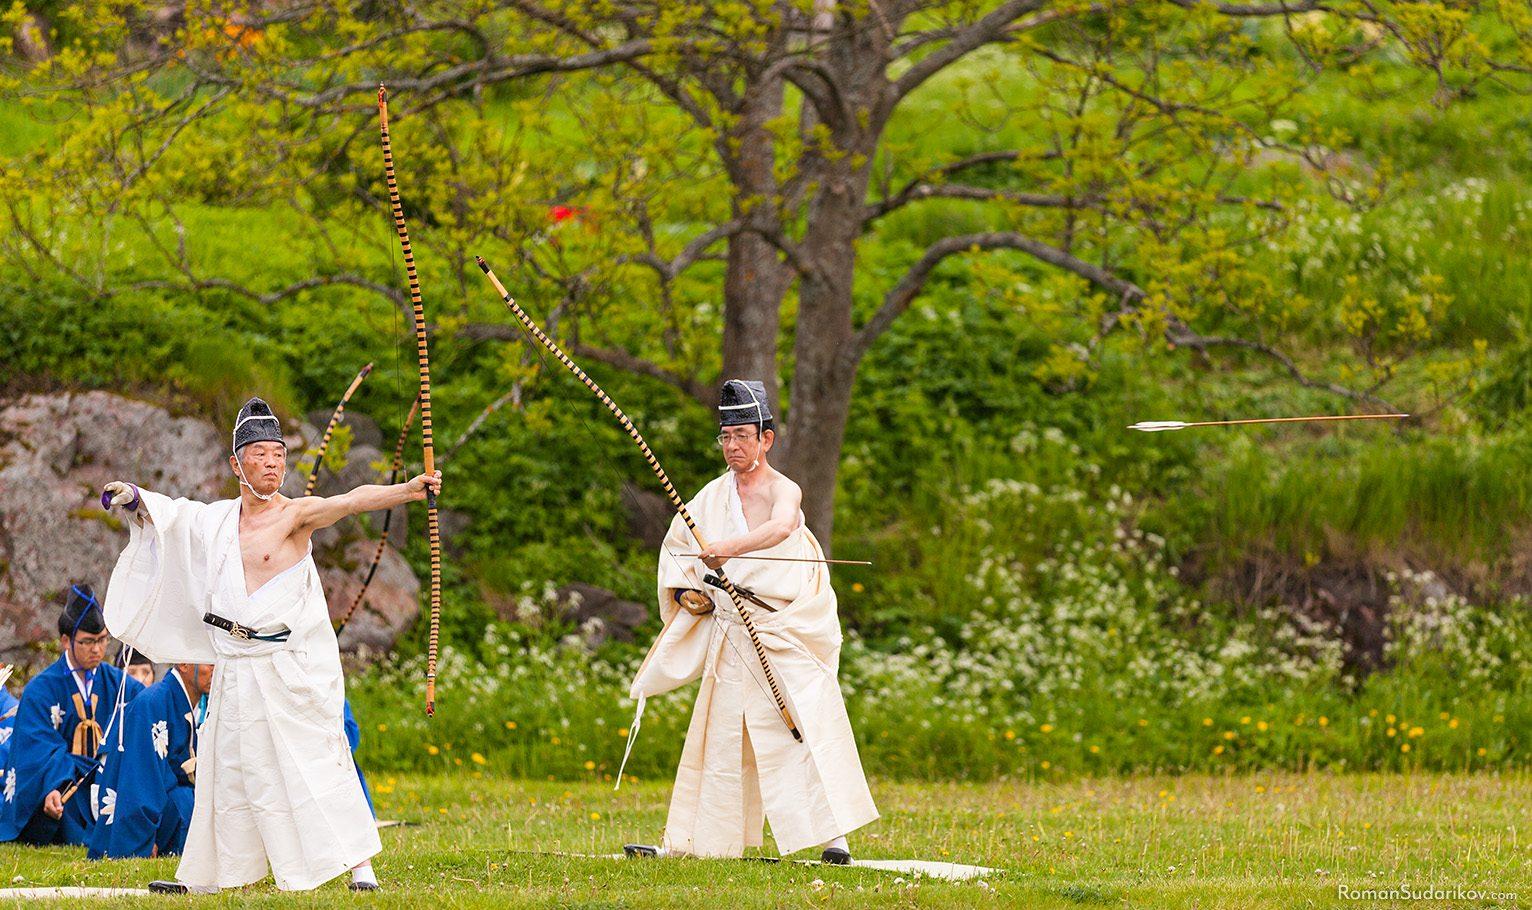 Ōmatoshiki, Japanese Archery Ceremony, Helsinki, Finland